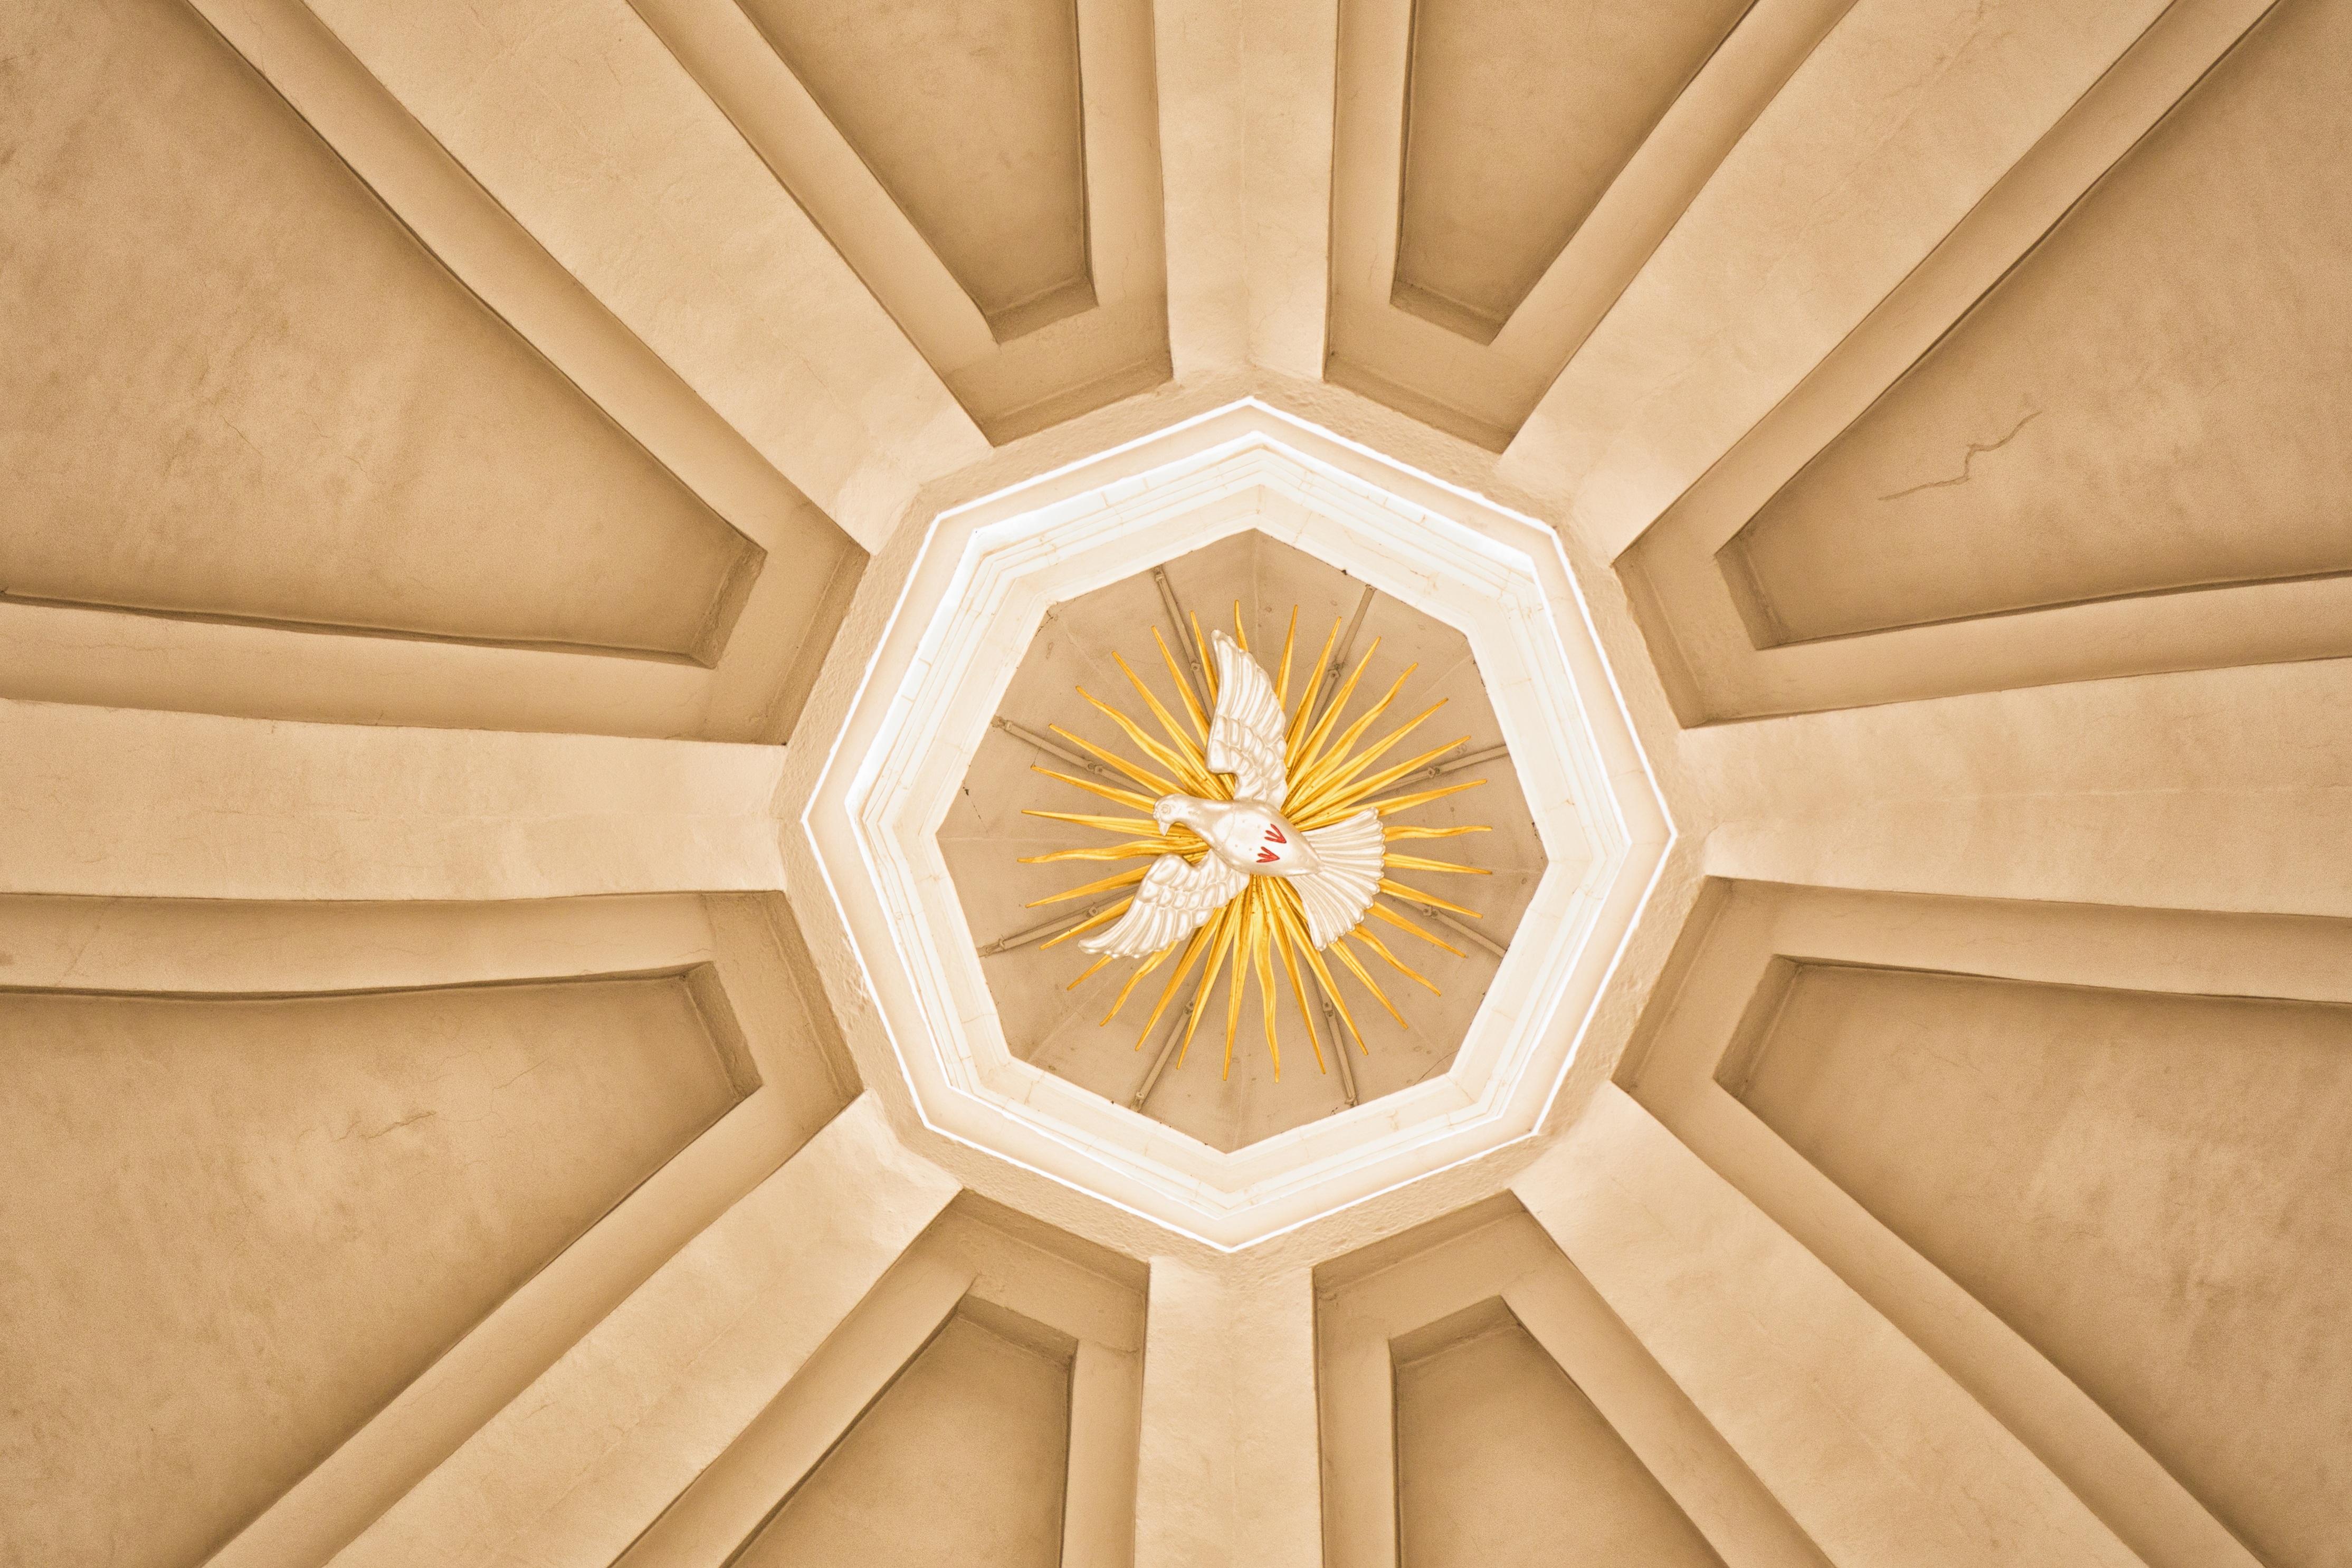 Free Images : light, wood, floor, atmosphere, ceiling, religion, rest,  yellow, christian, lighting, spiritual, pray, art, gold, design, faith,  symmetry, ...